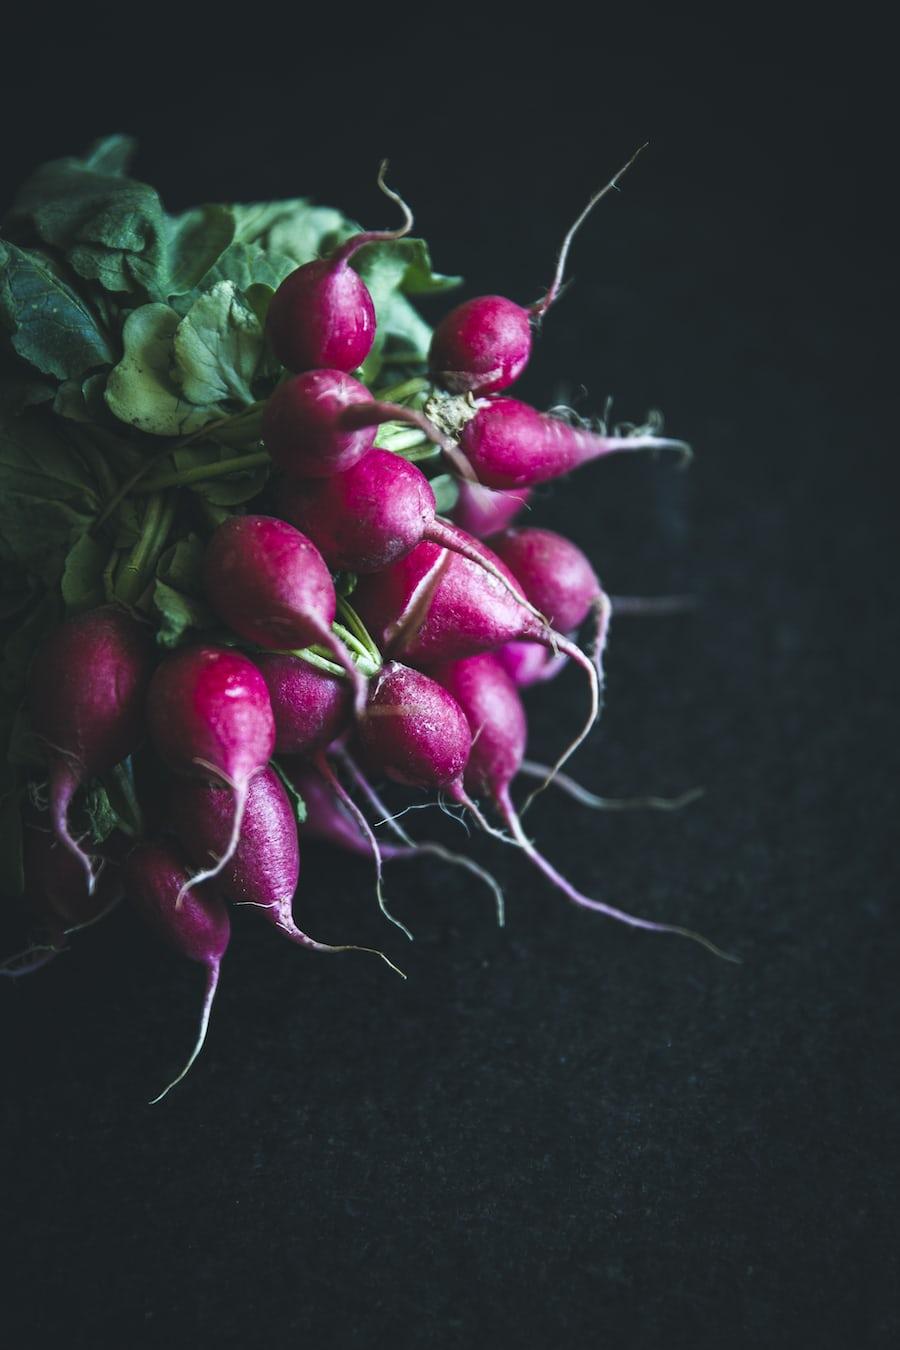 Red radish picture